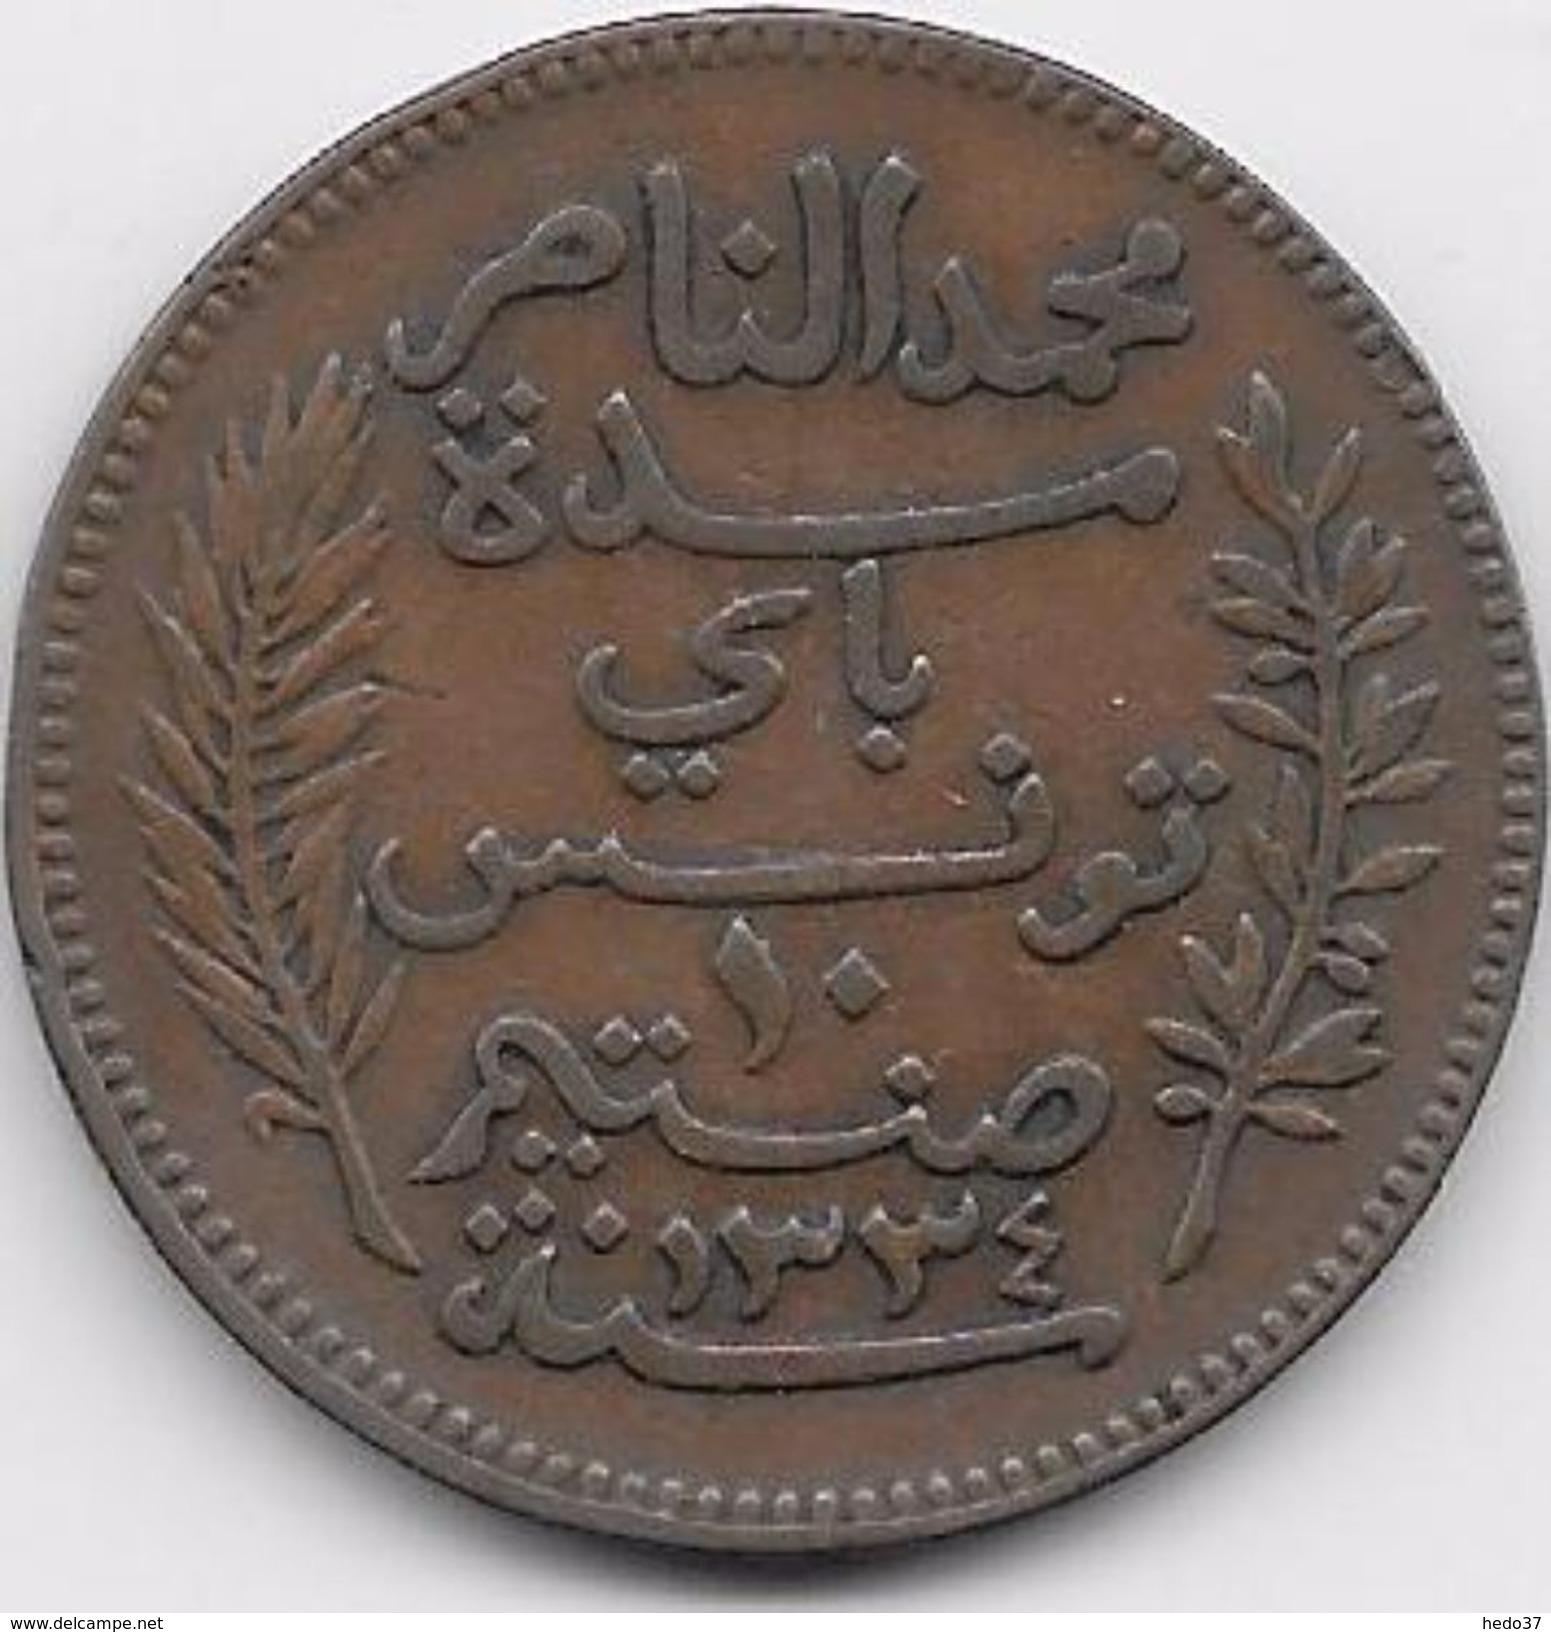 Tunisie 10 Centimes 1916 - Monnaies